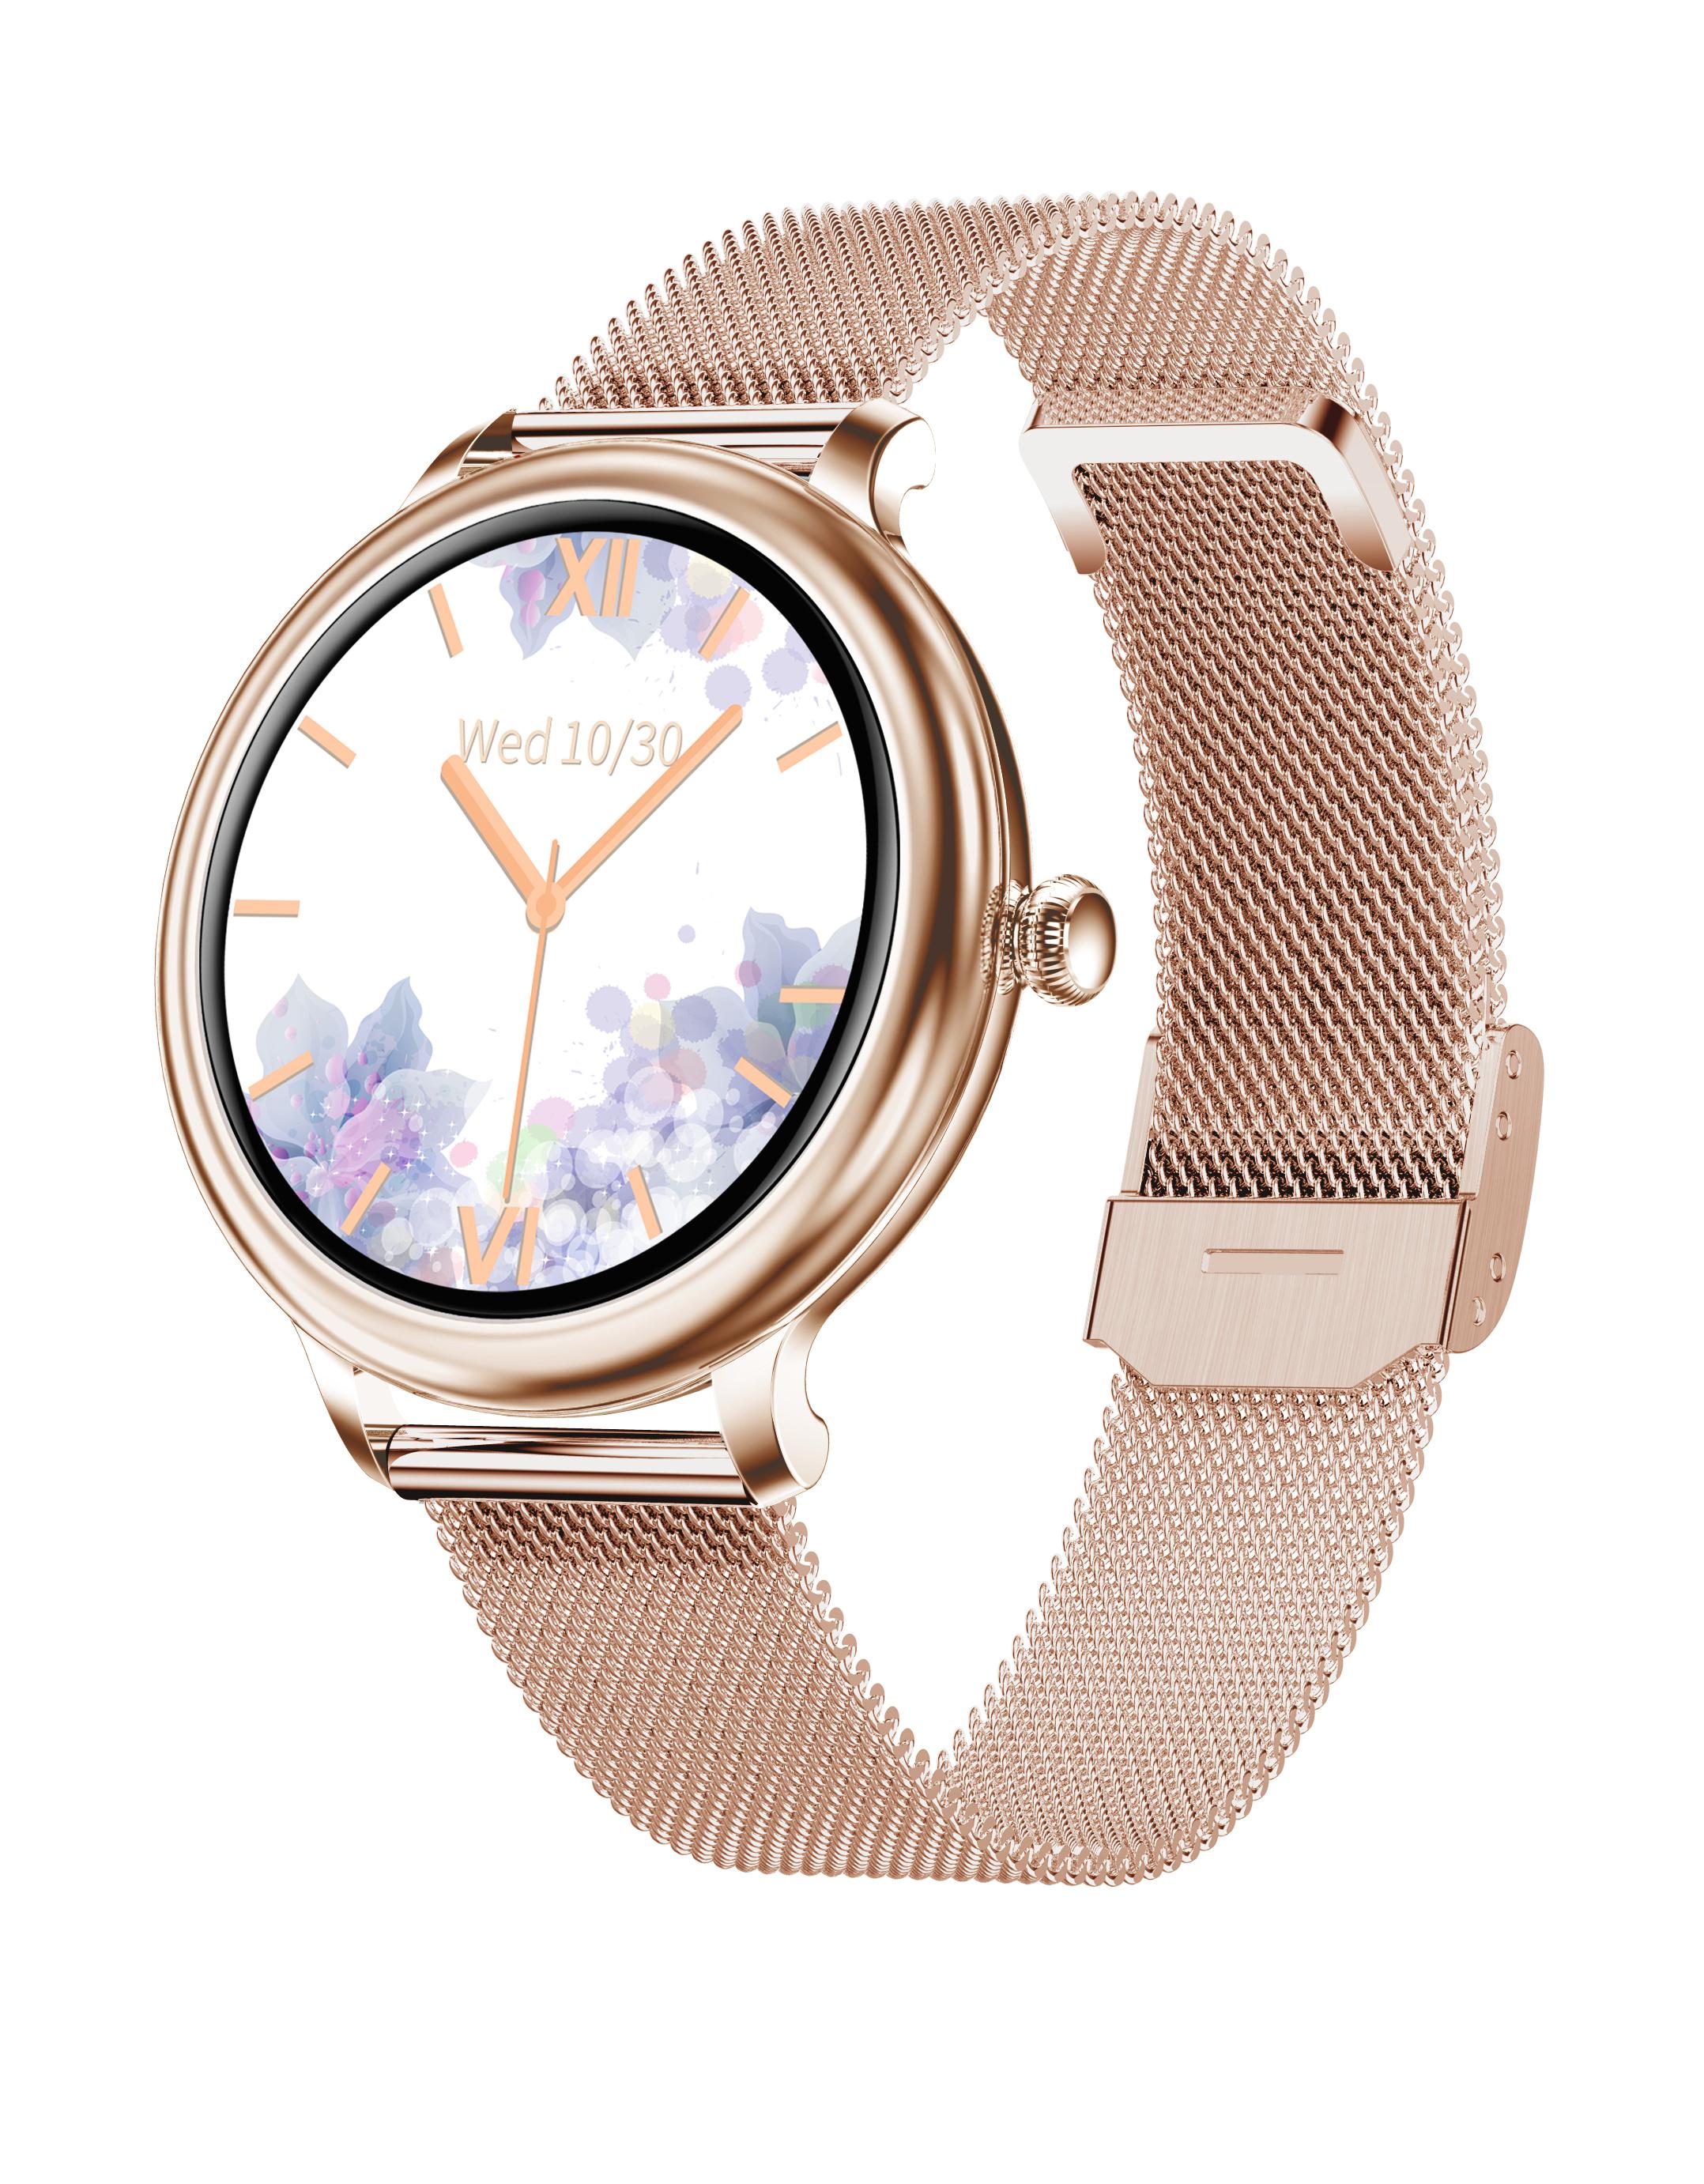 Ny13 Smart Watch Lady Heart Rate Blood Pressure Monitor Ip68 Waterproof 2.5d Lcd Screen Smartwatch Steel belt rose gold